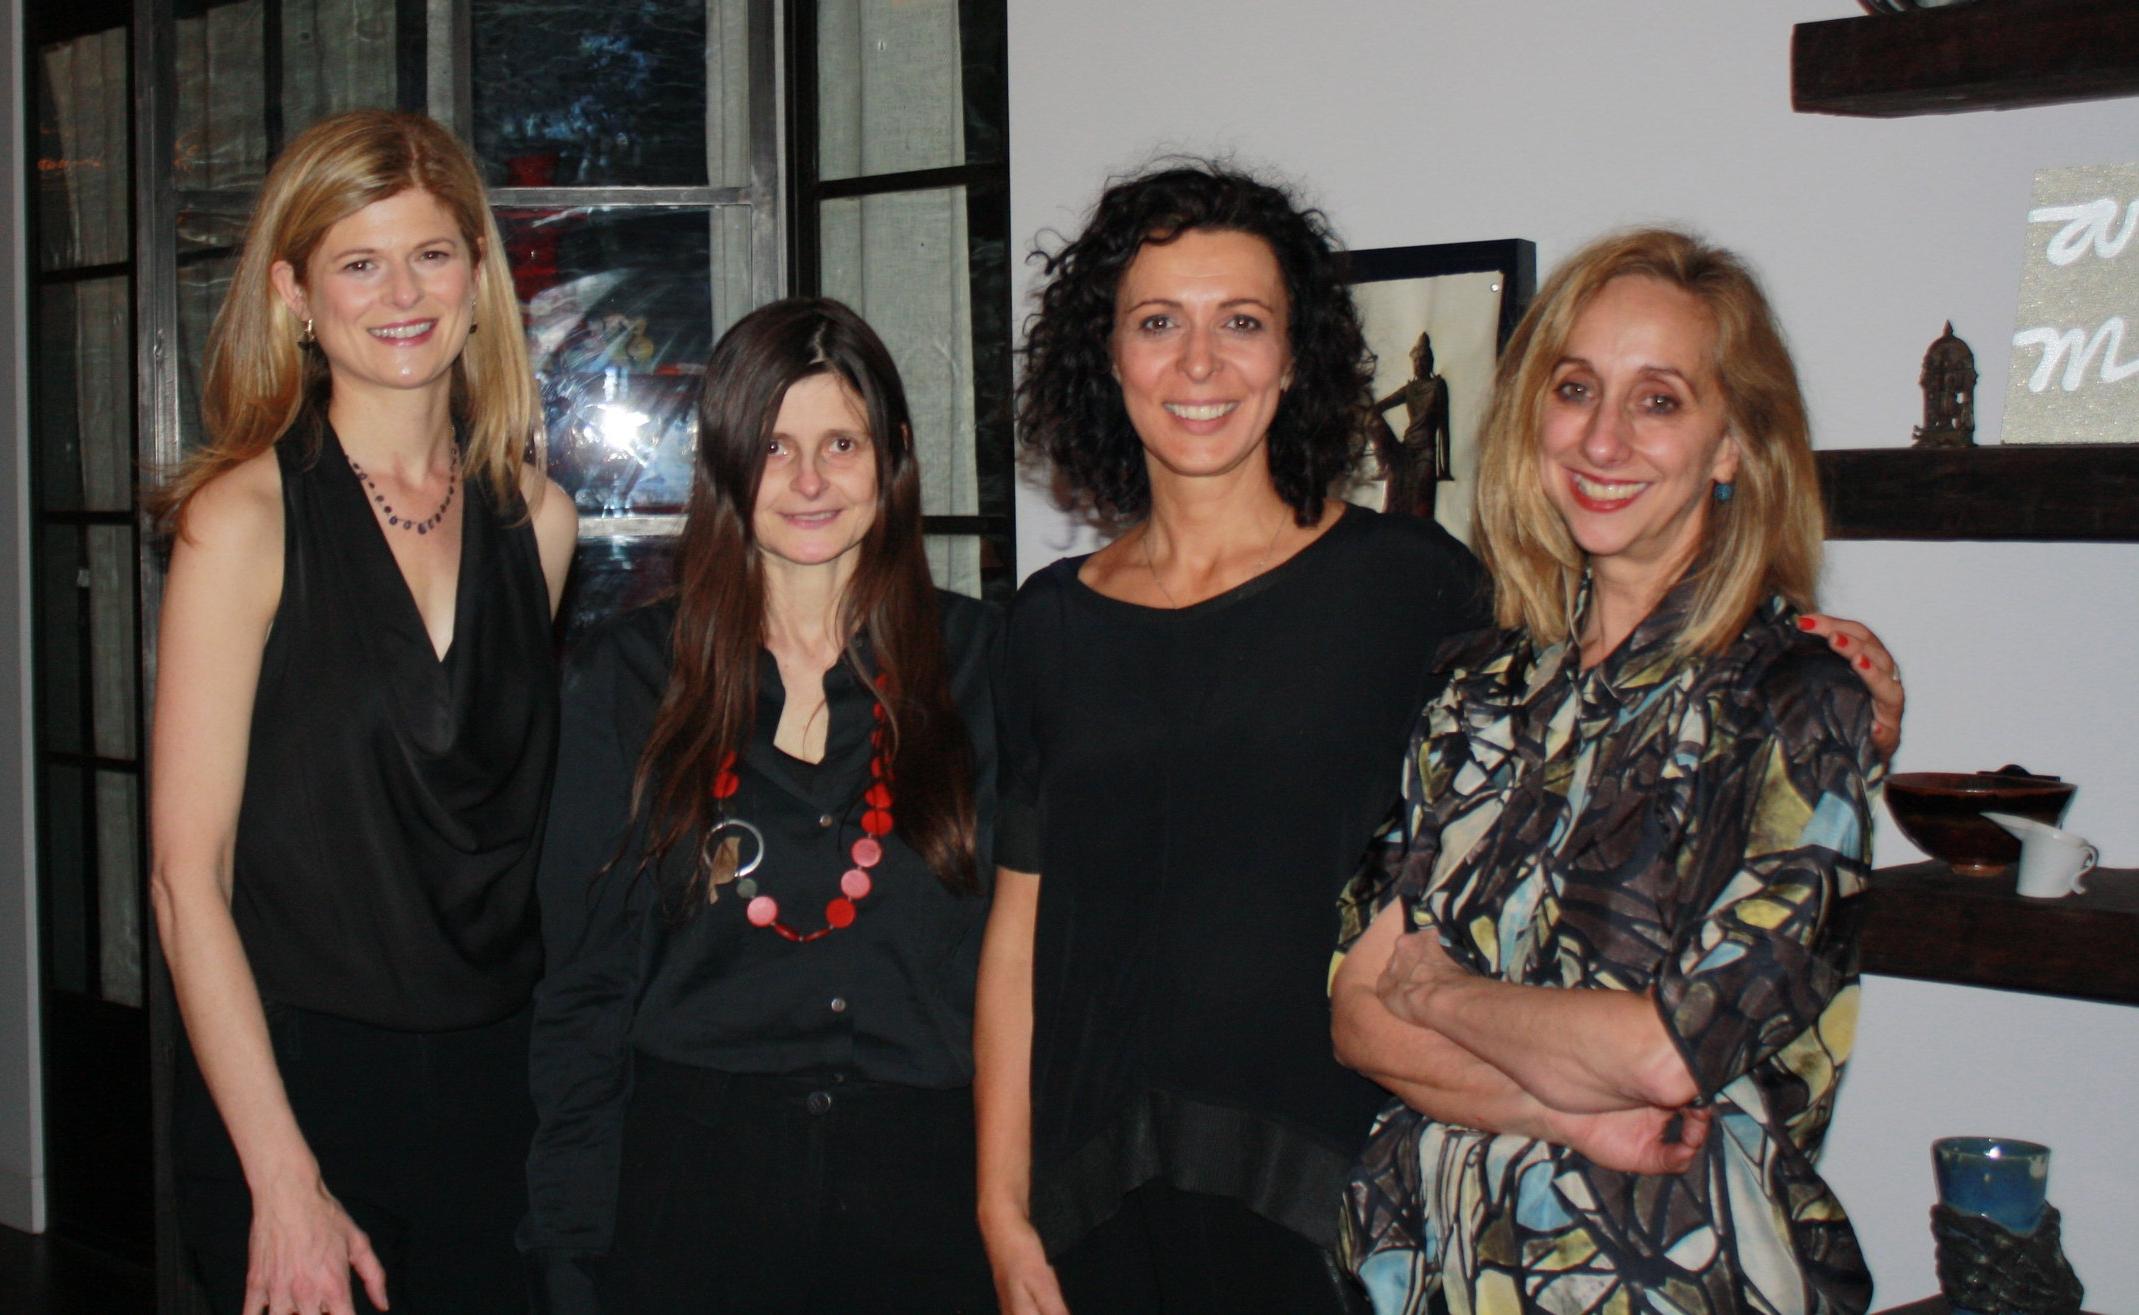 Prue Clarke, Belinda Luscombe, Serafina Maiorano and Donna Green